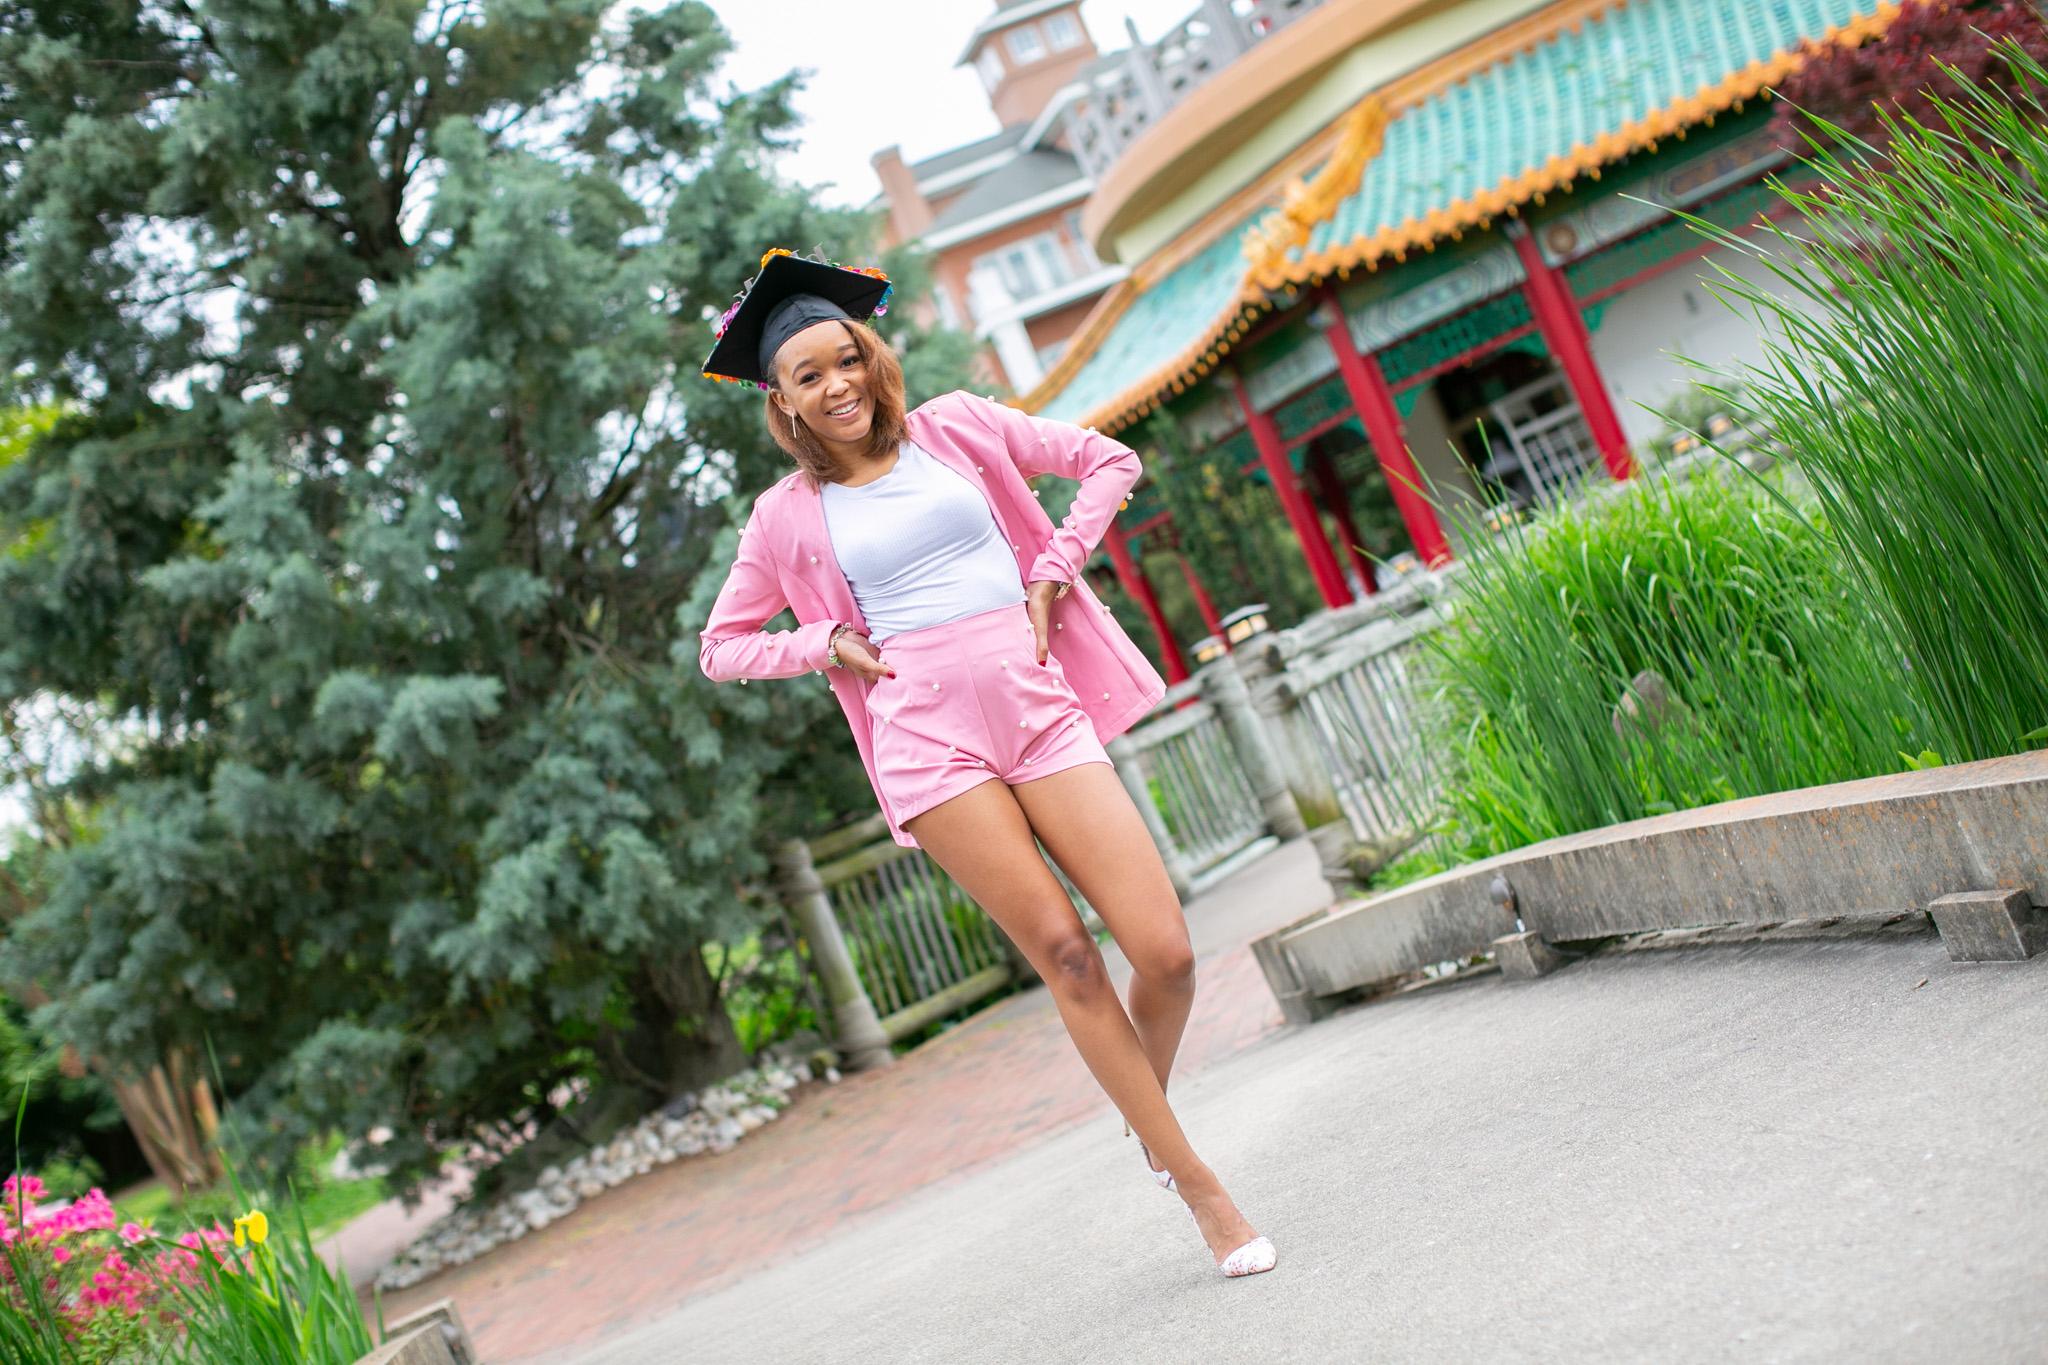 graduate walking in garden